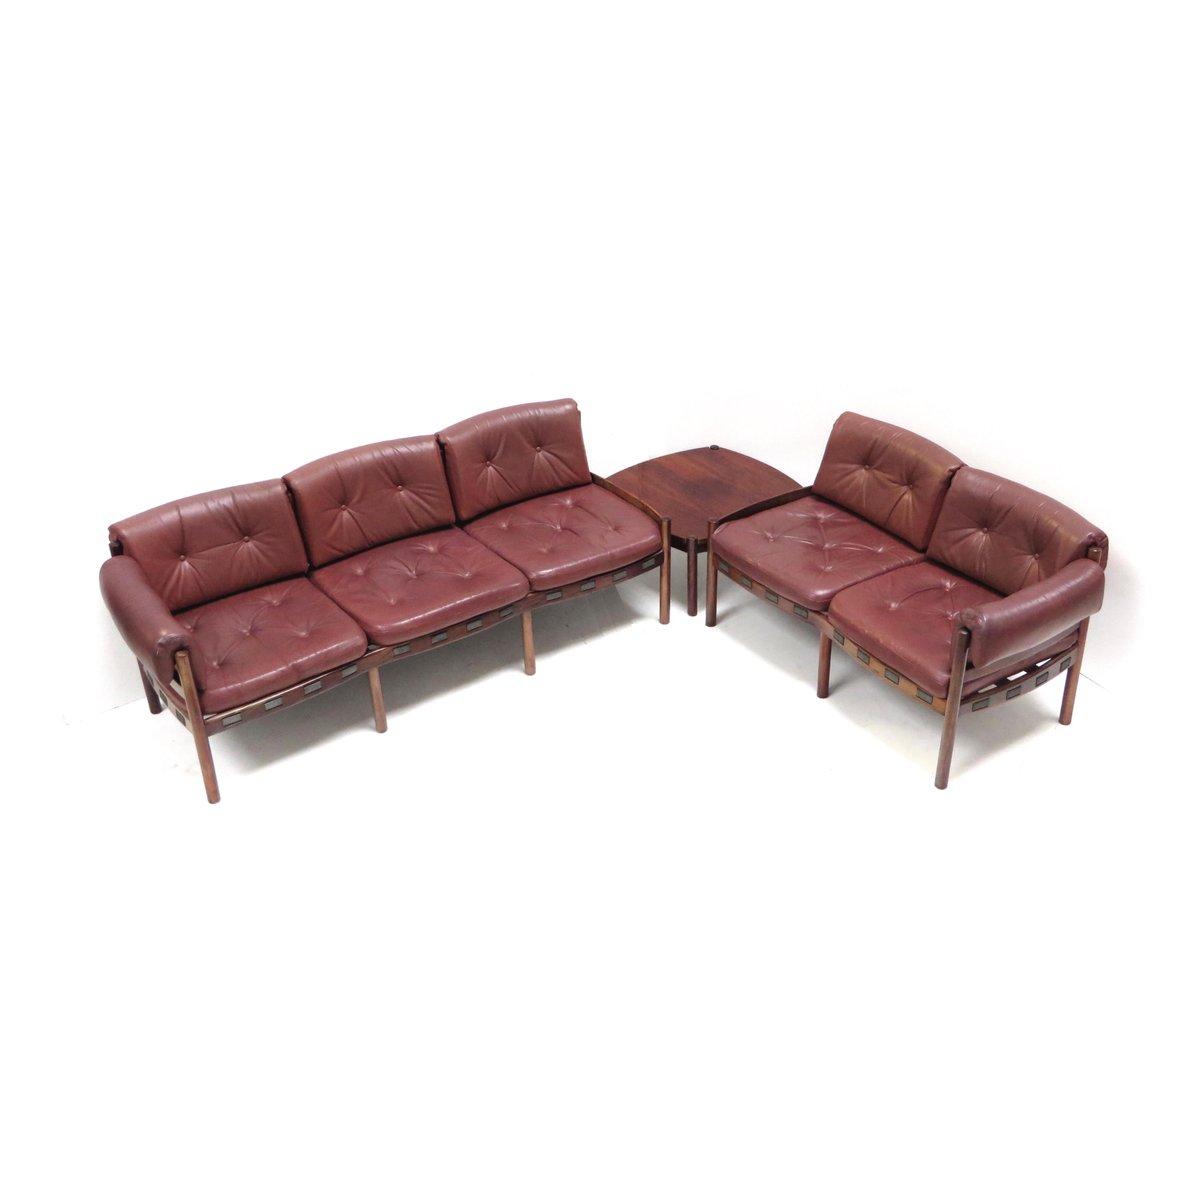 Corner Sofa Bed Sale Ireland: Leather Corner Sofa With Table, 1960s For Sale At Pamono